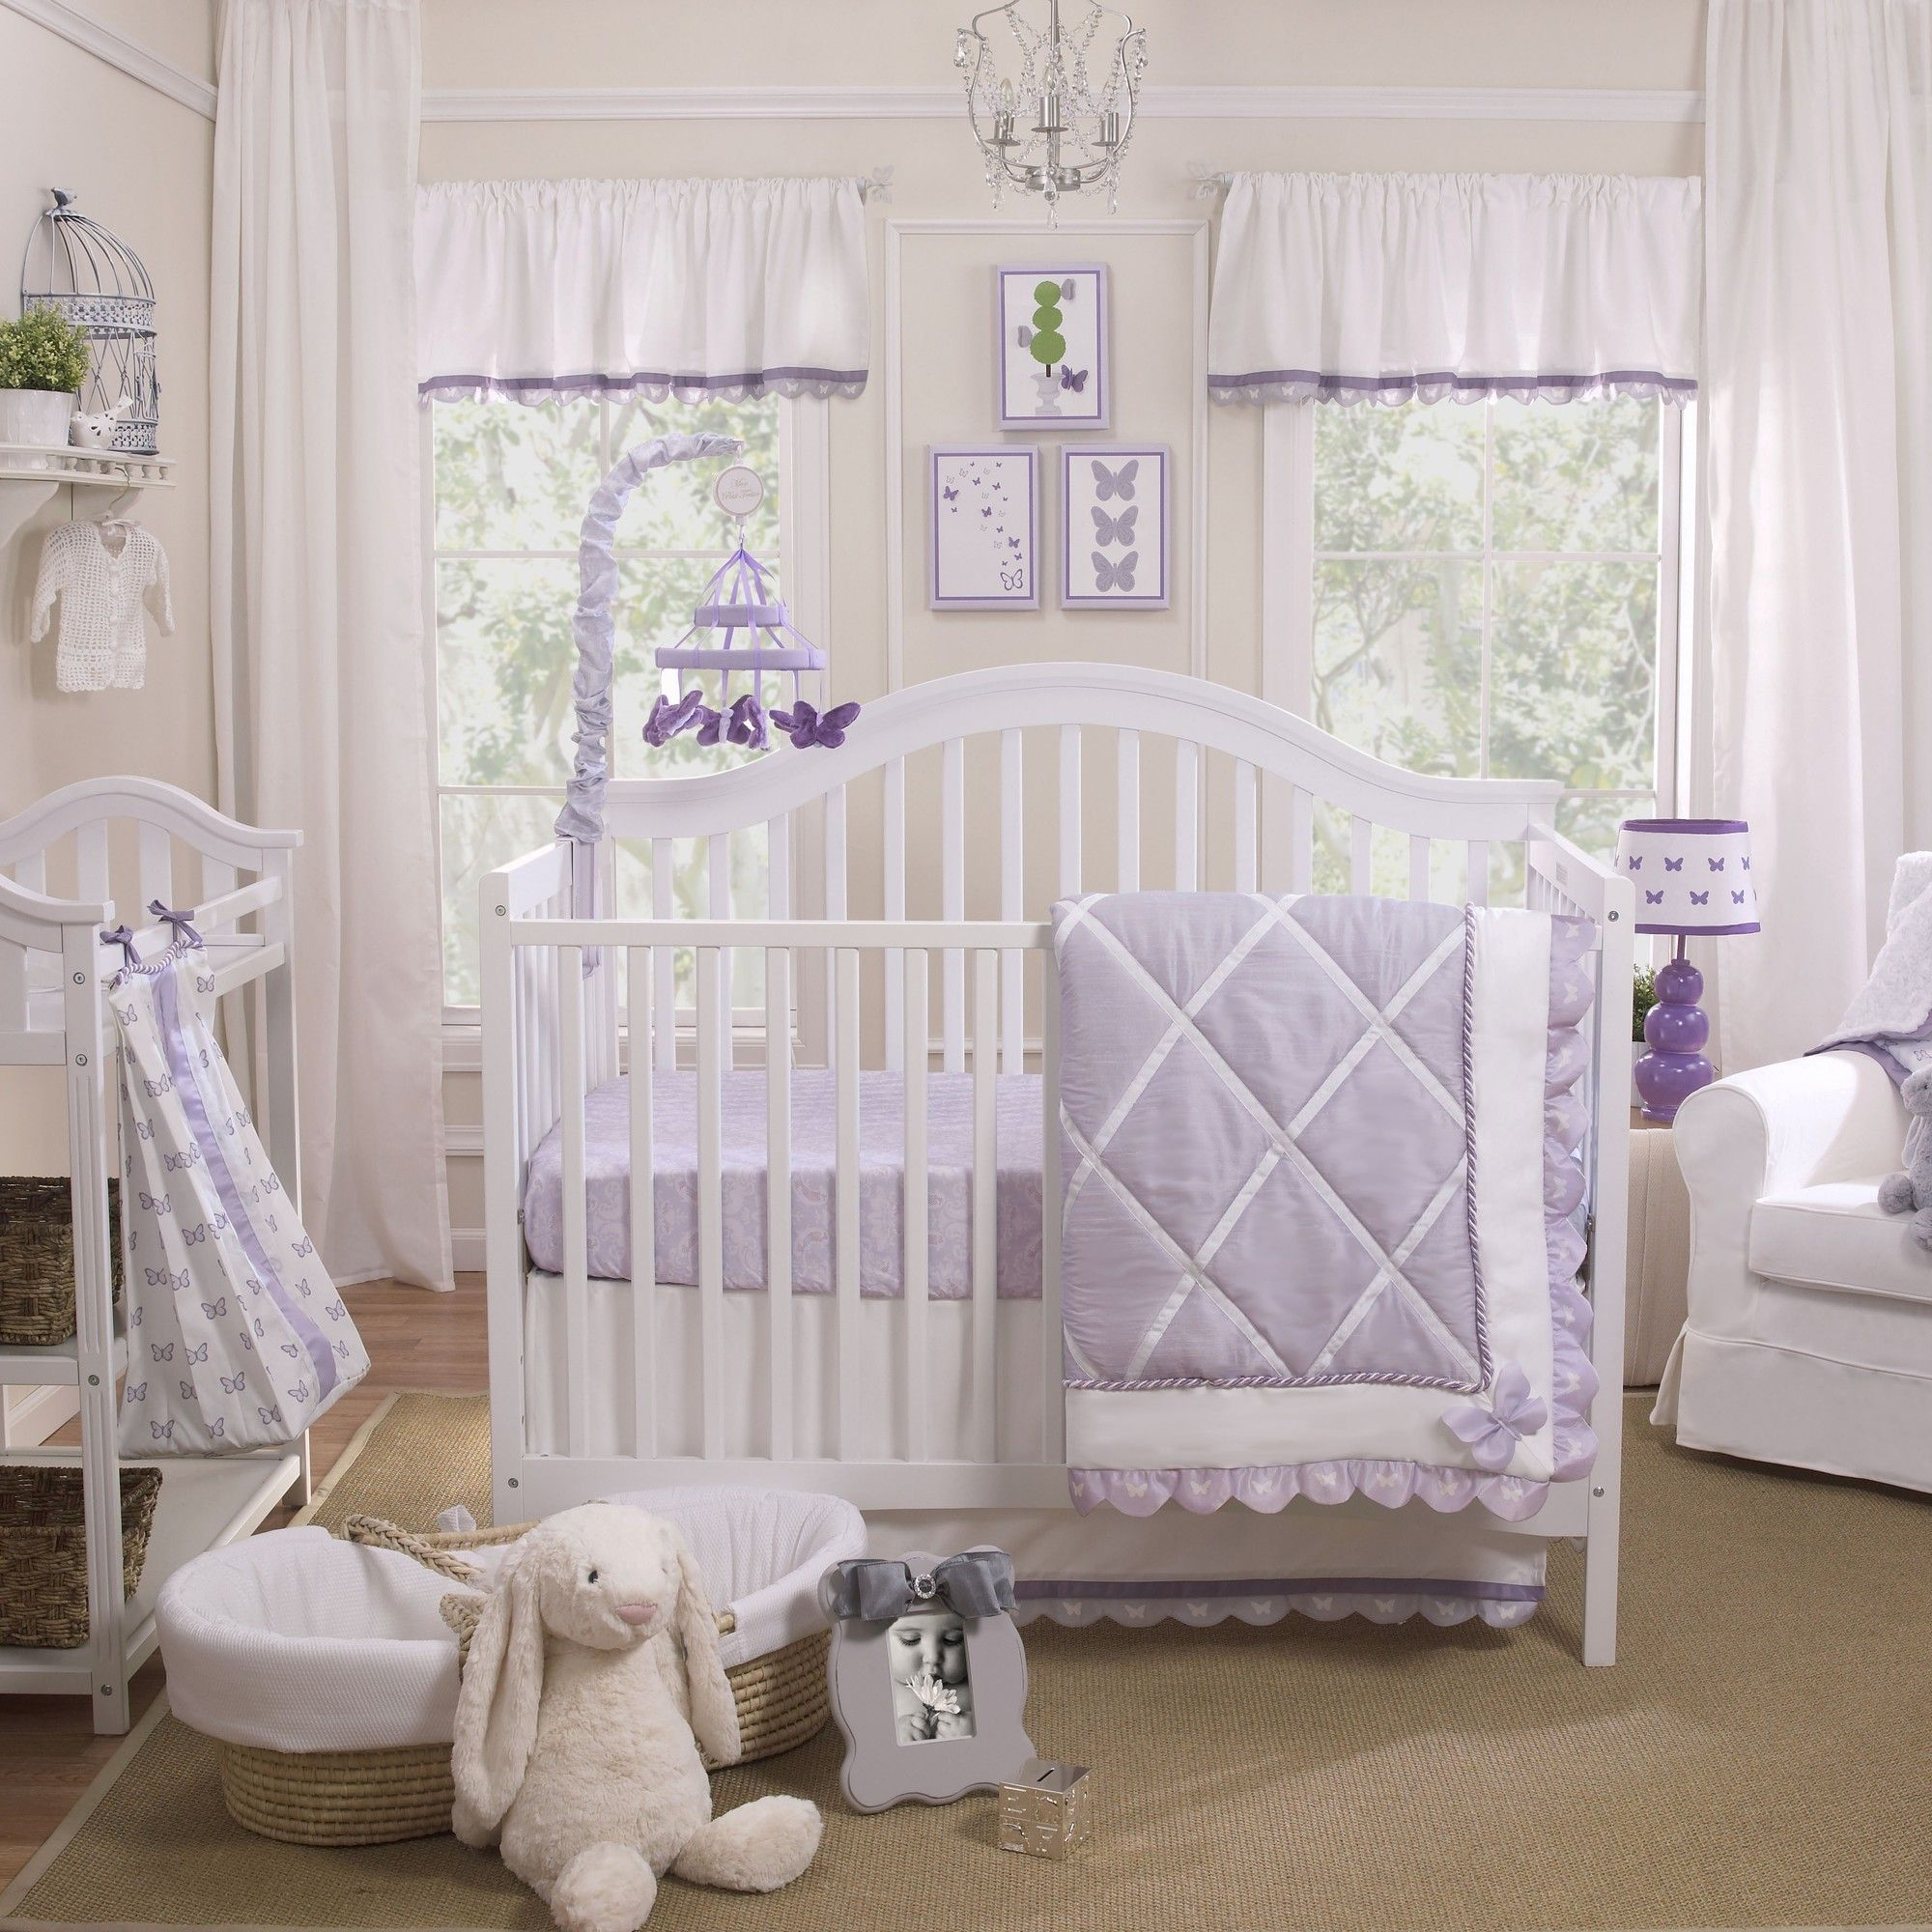 Papillon 4 Piece Crib Bedding Set   Jaycie Lee   Pinterest